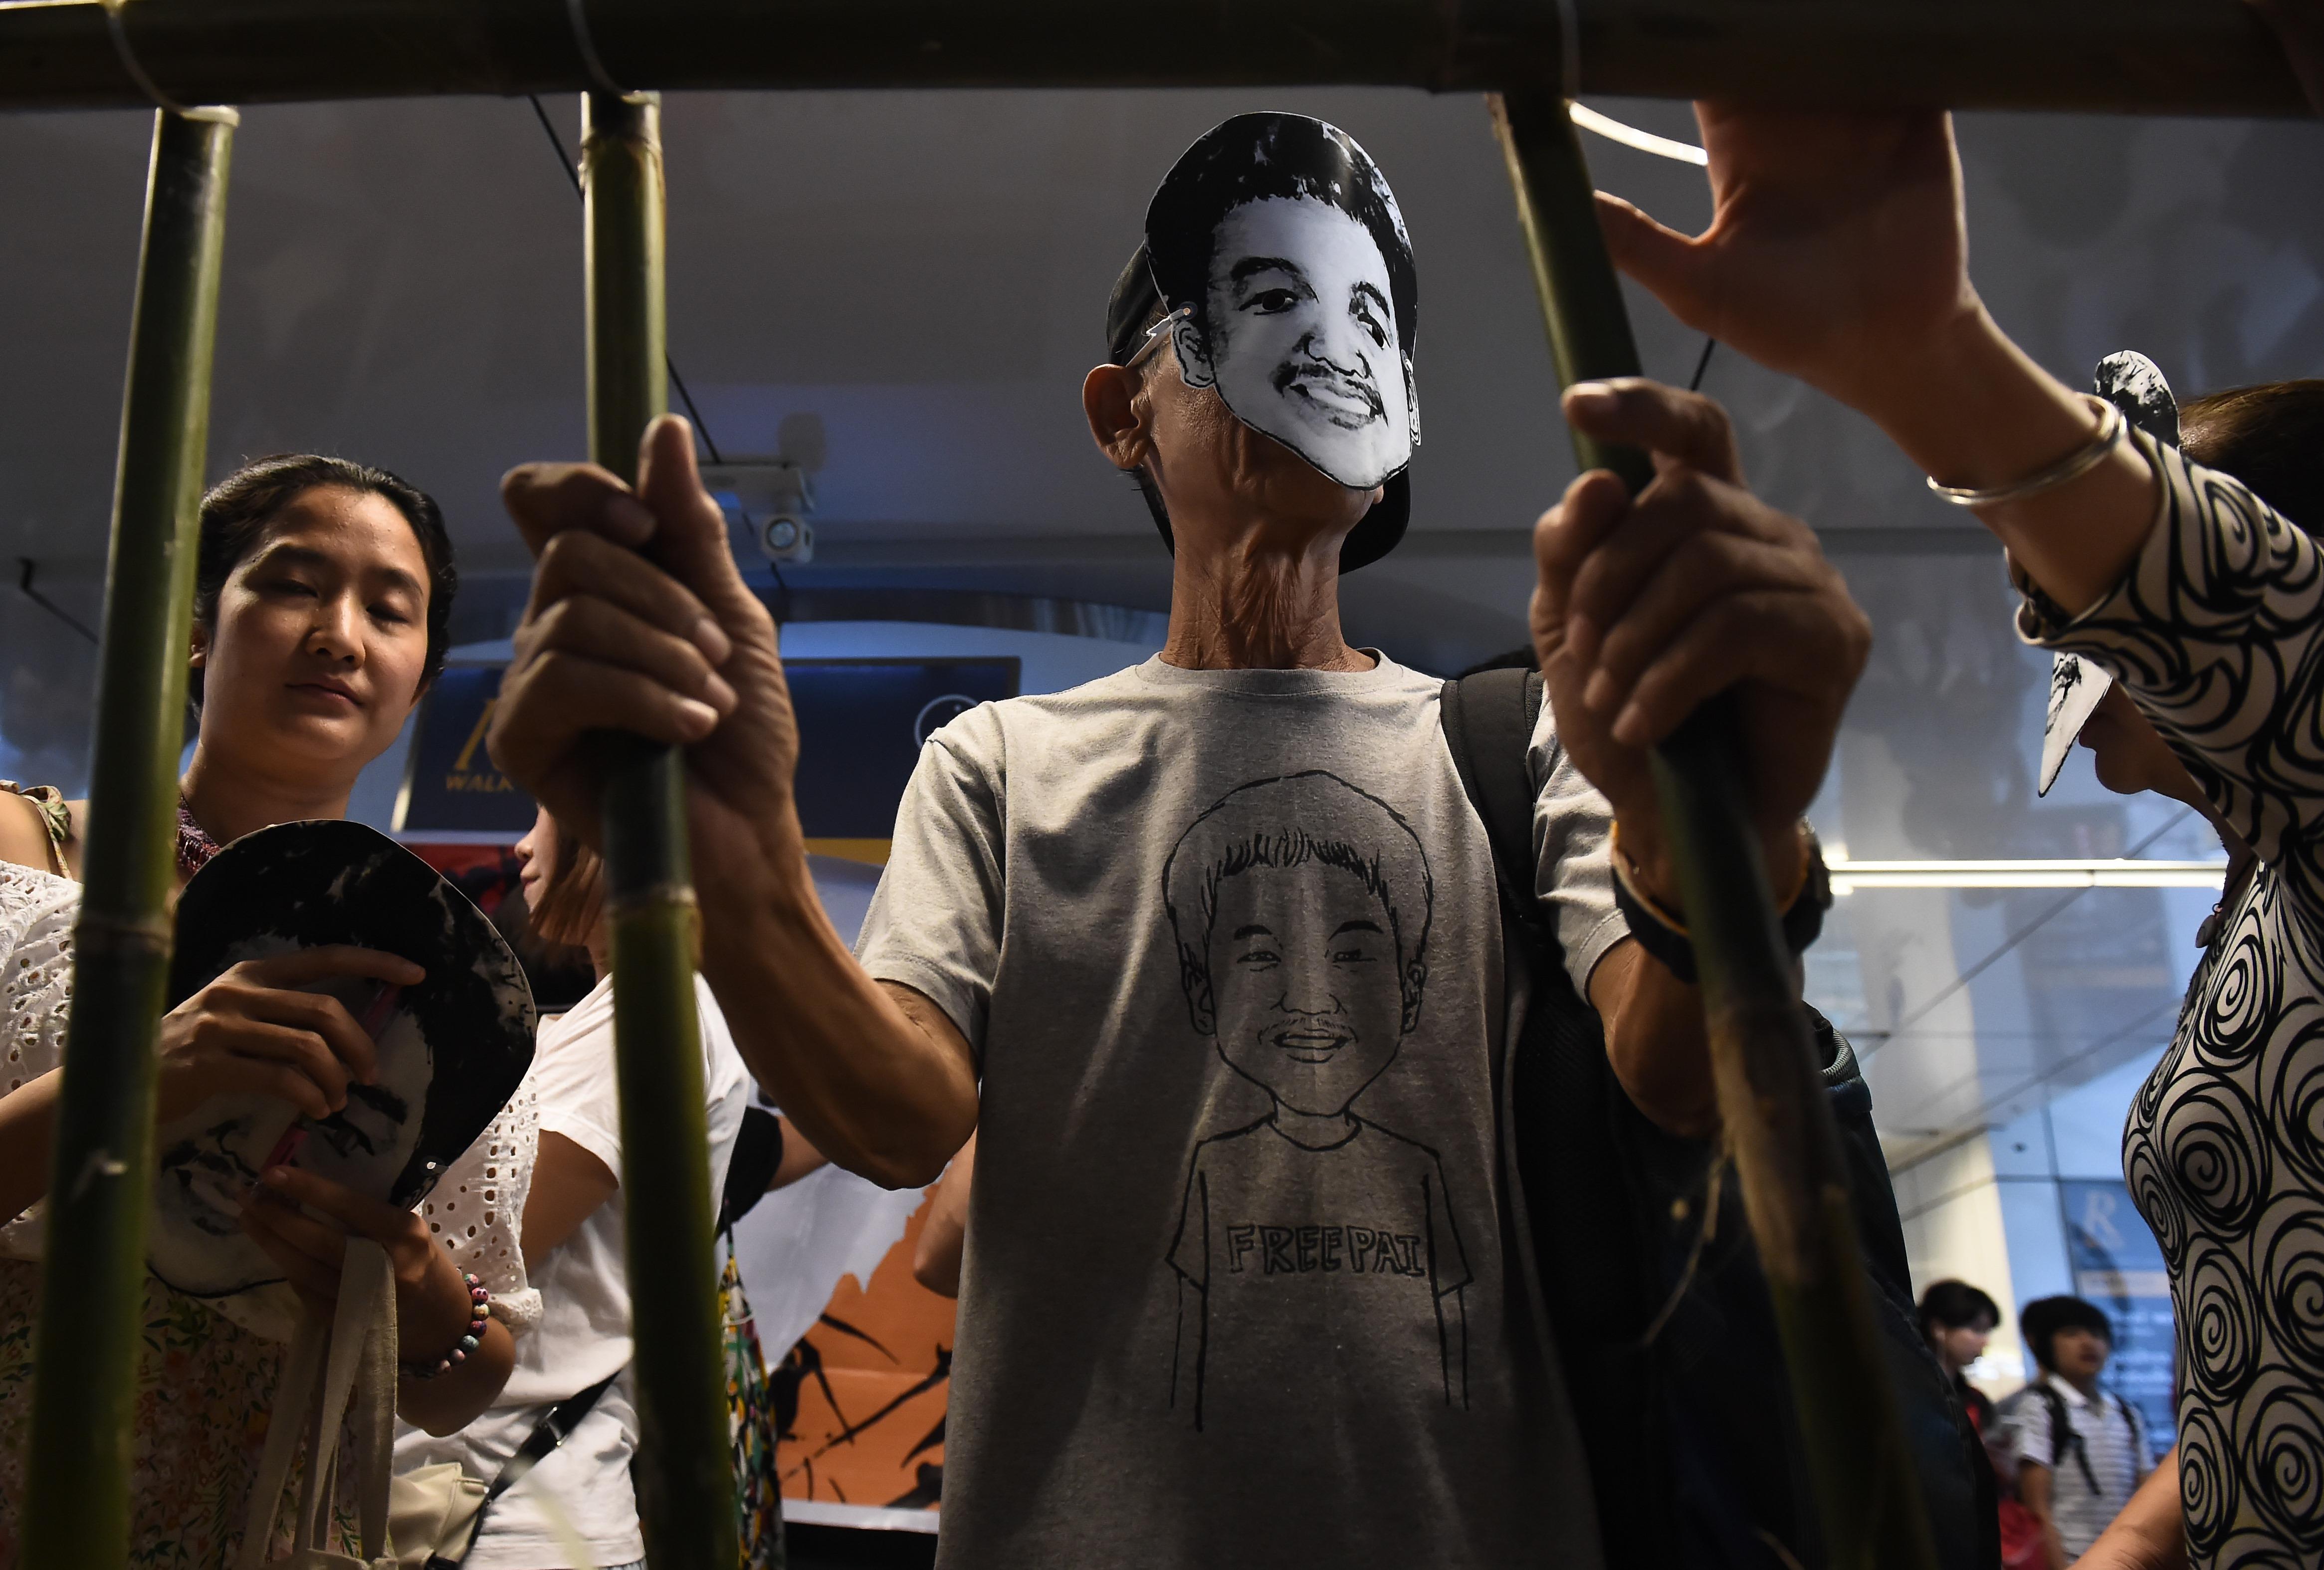 People stand behind makeshift bars wearing masks of Thai human rights activist Jatupat Pai Boonpattararaksa in Bangkok on June 22, 2017.